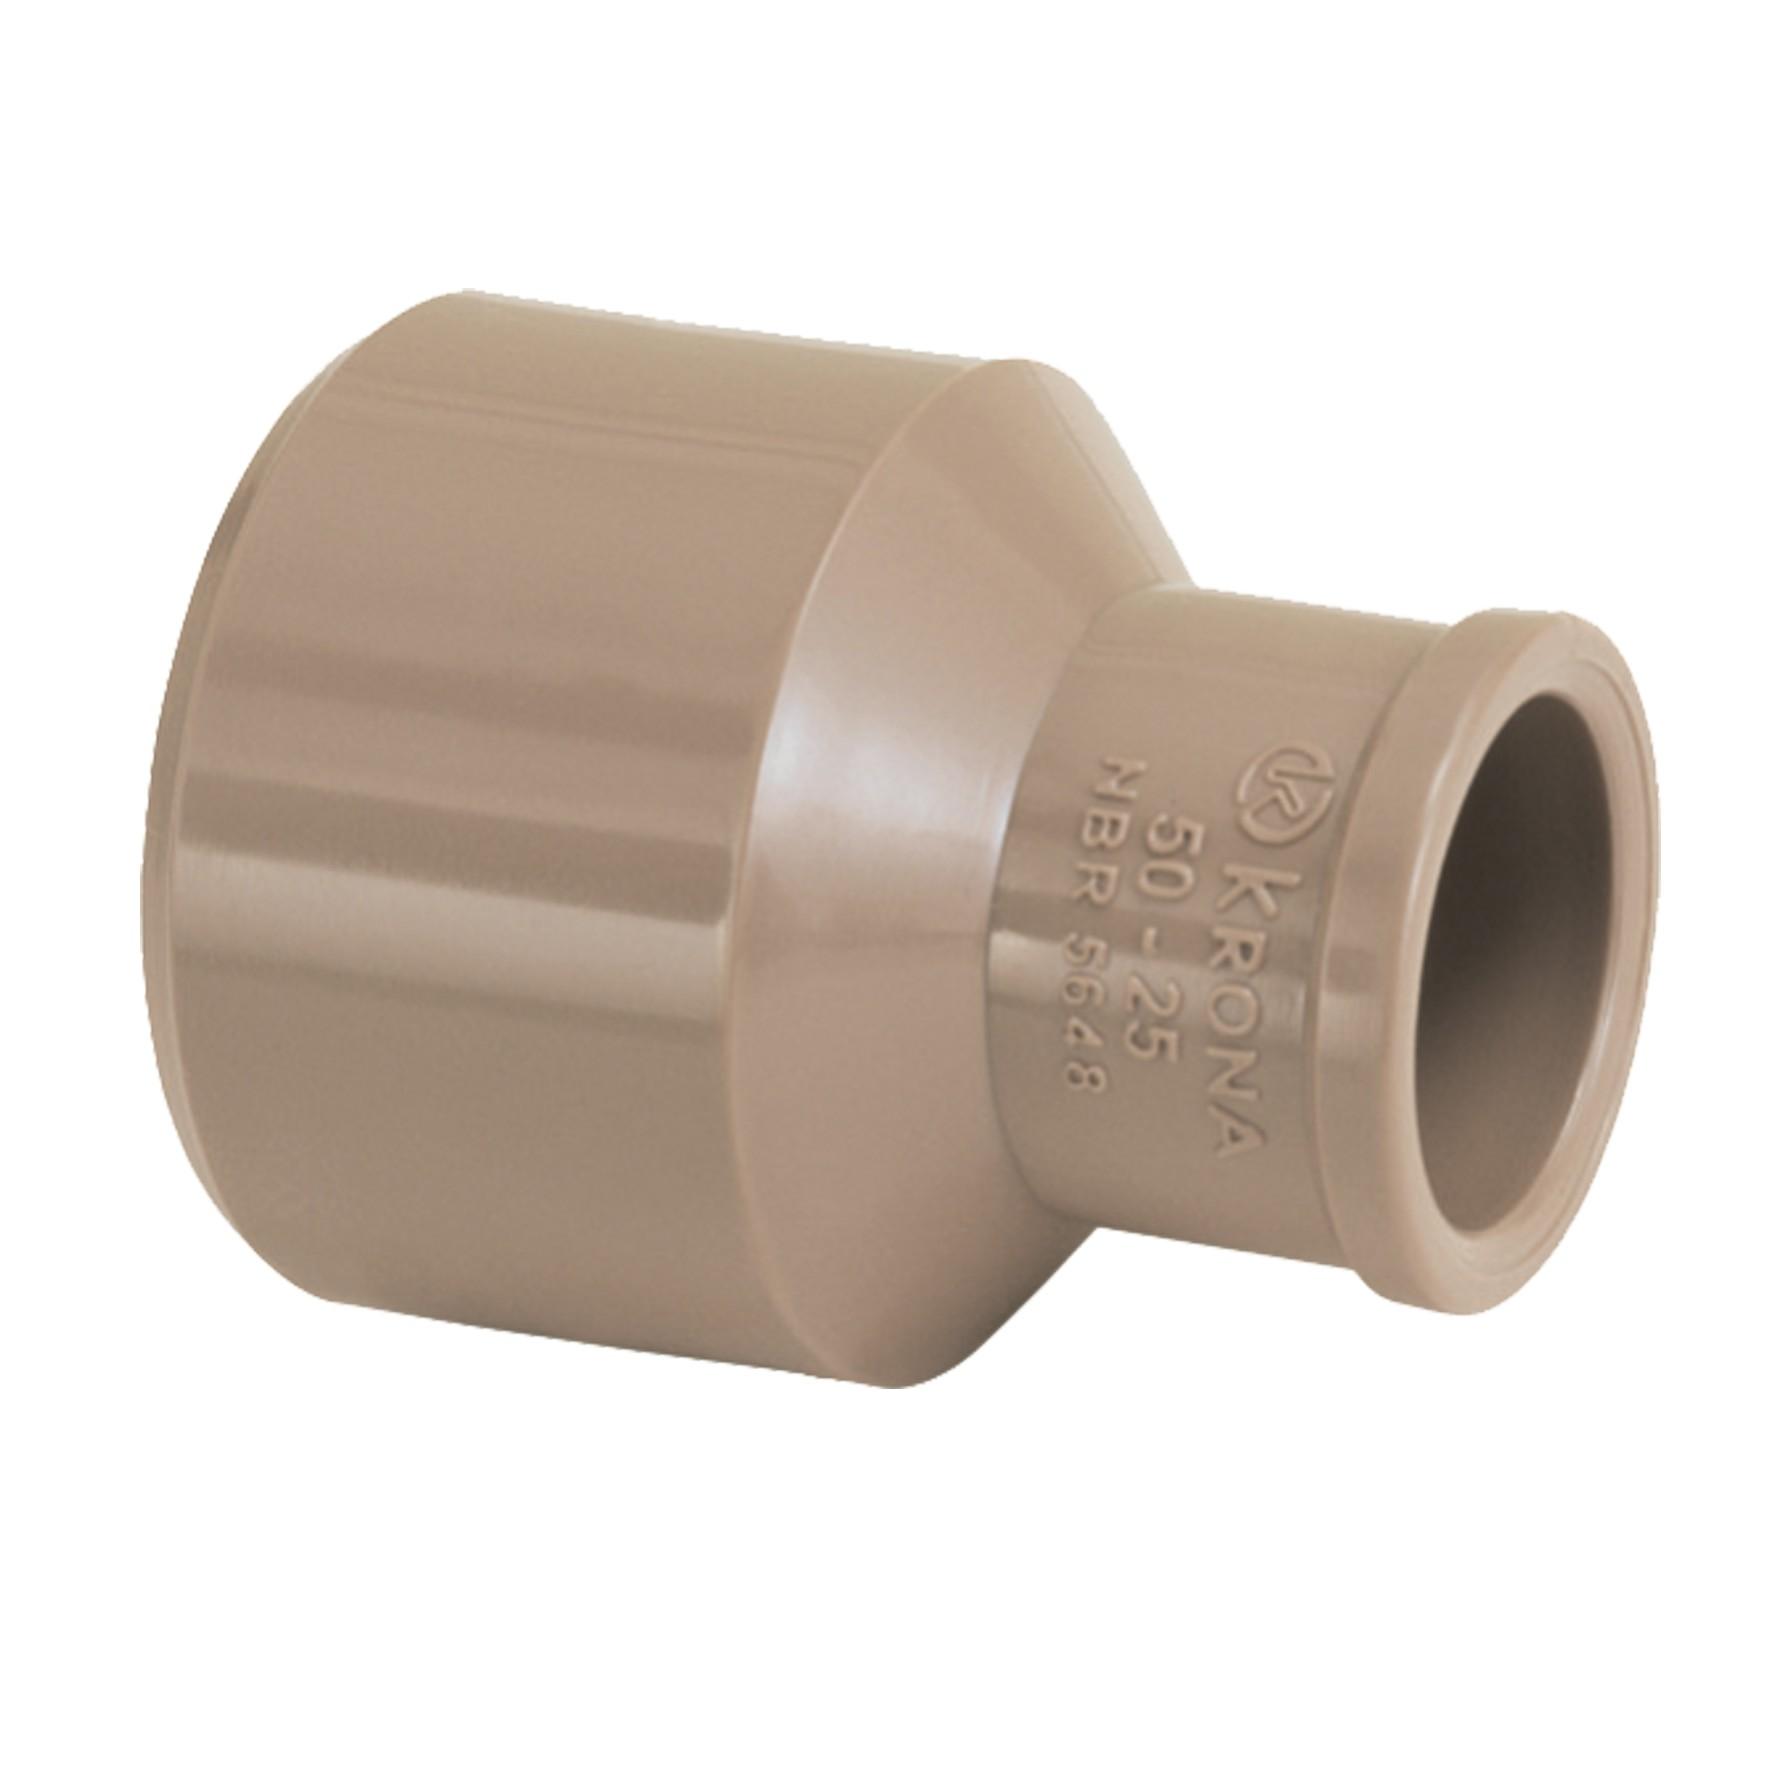 Bucha Longa Simples Soldavel PVC 32mm - Krona